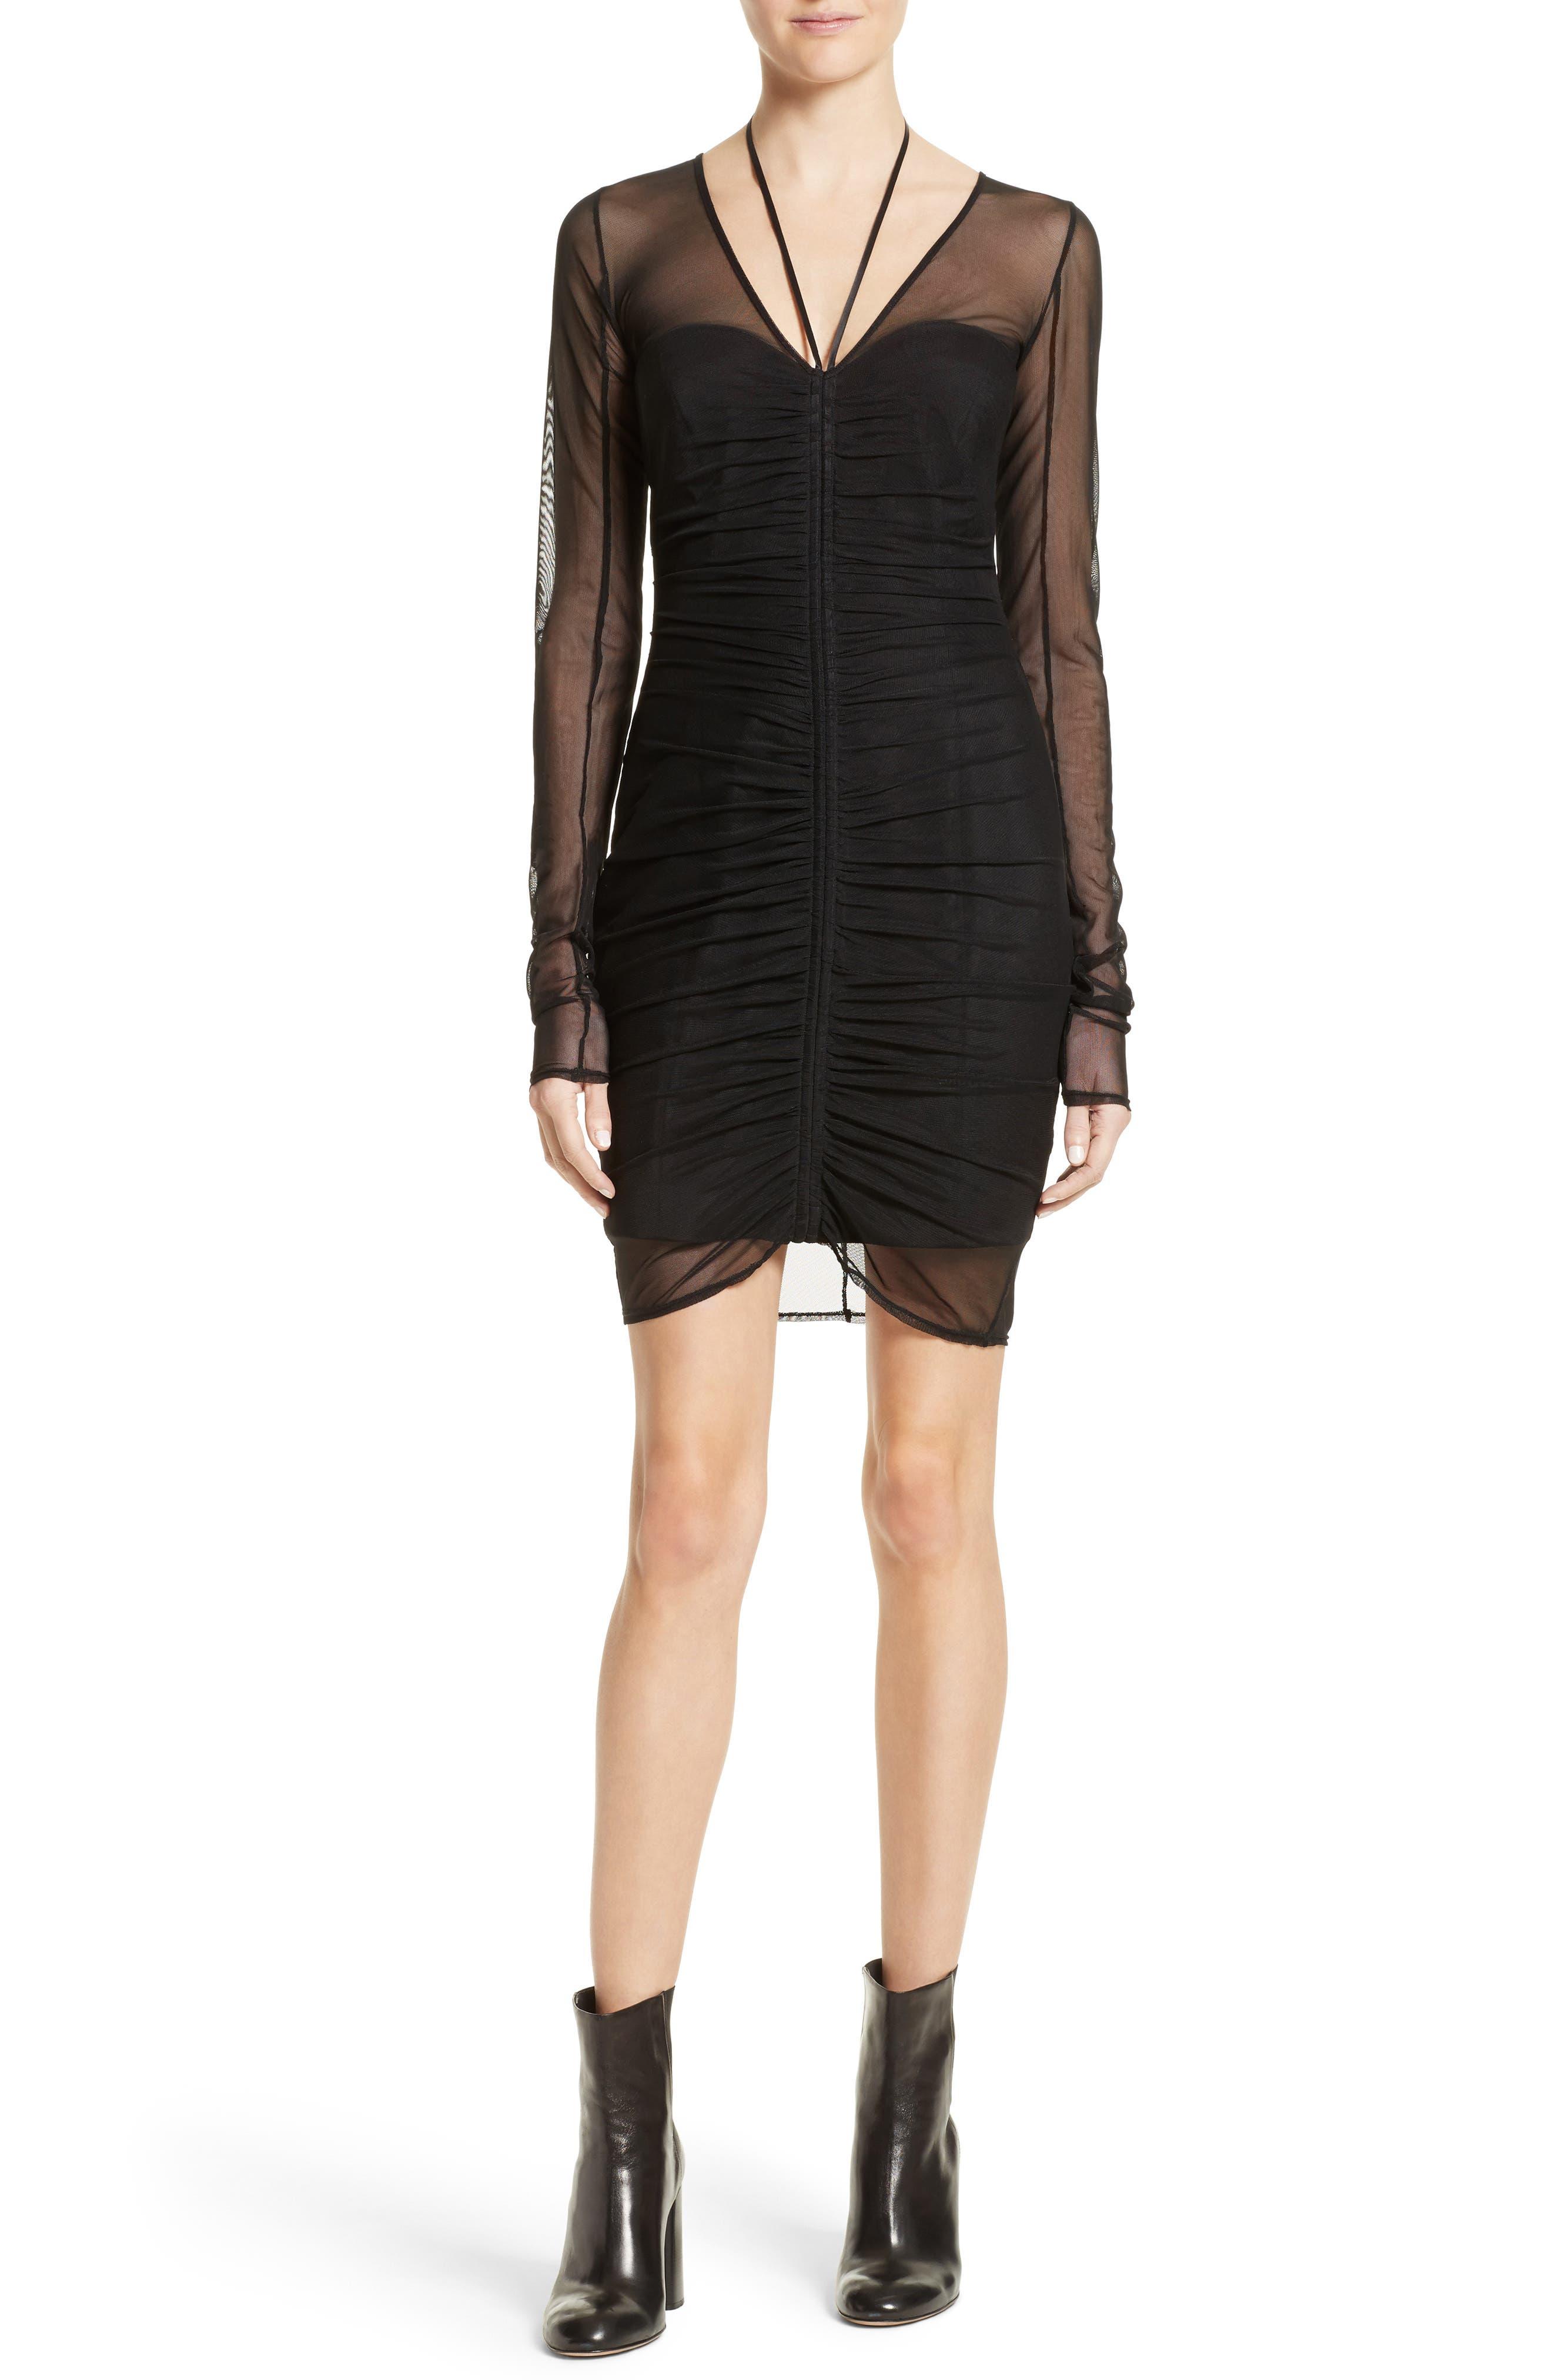 Alternate Image 1 Selected - Cinq à Sept Grant Mesh Dress